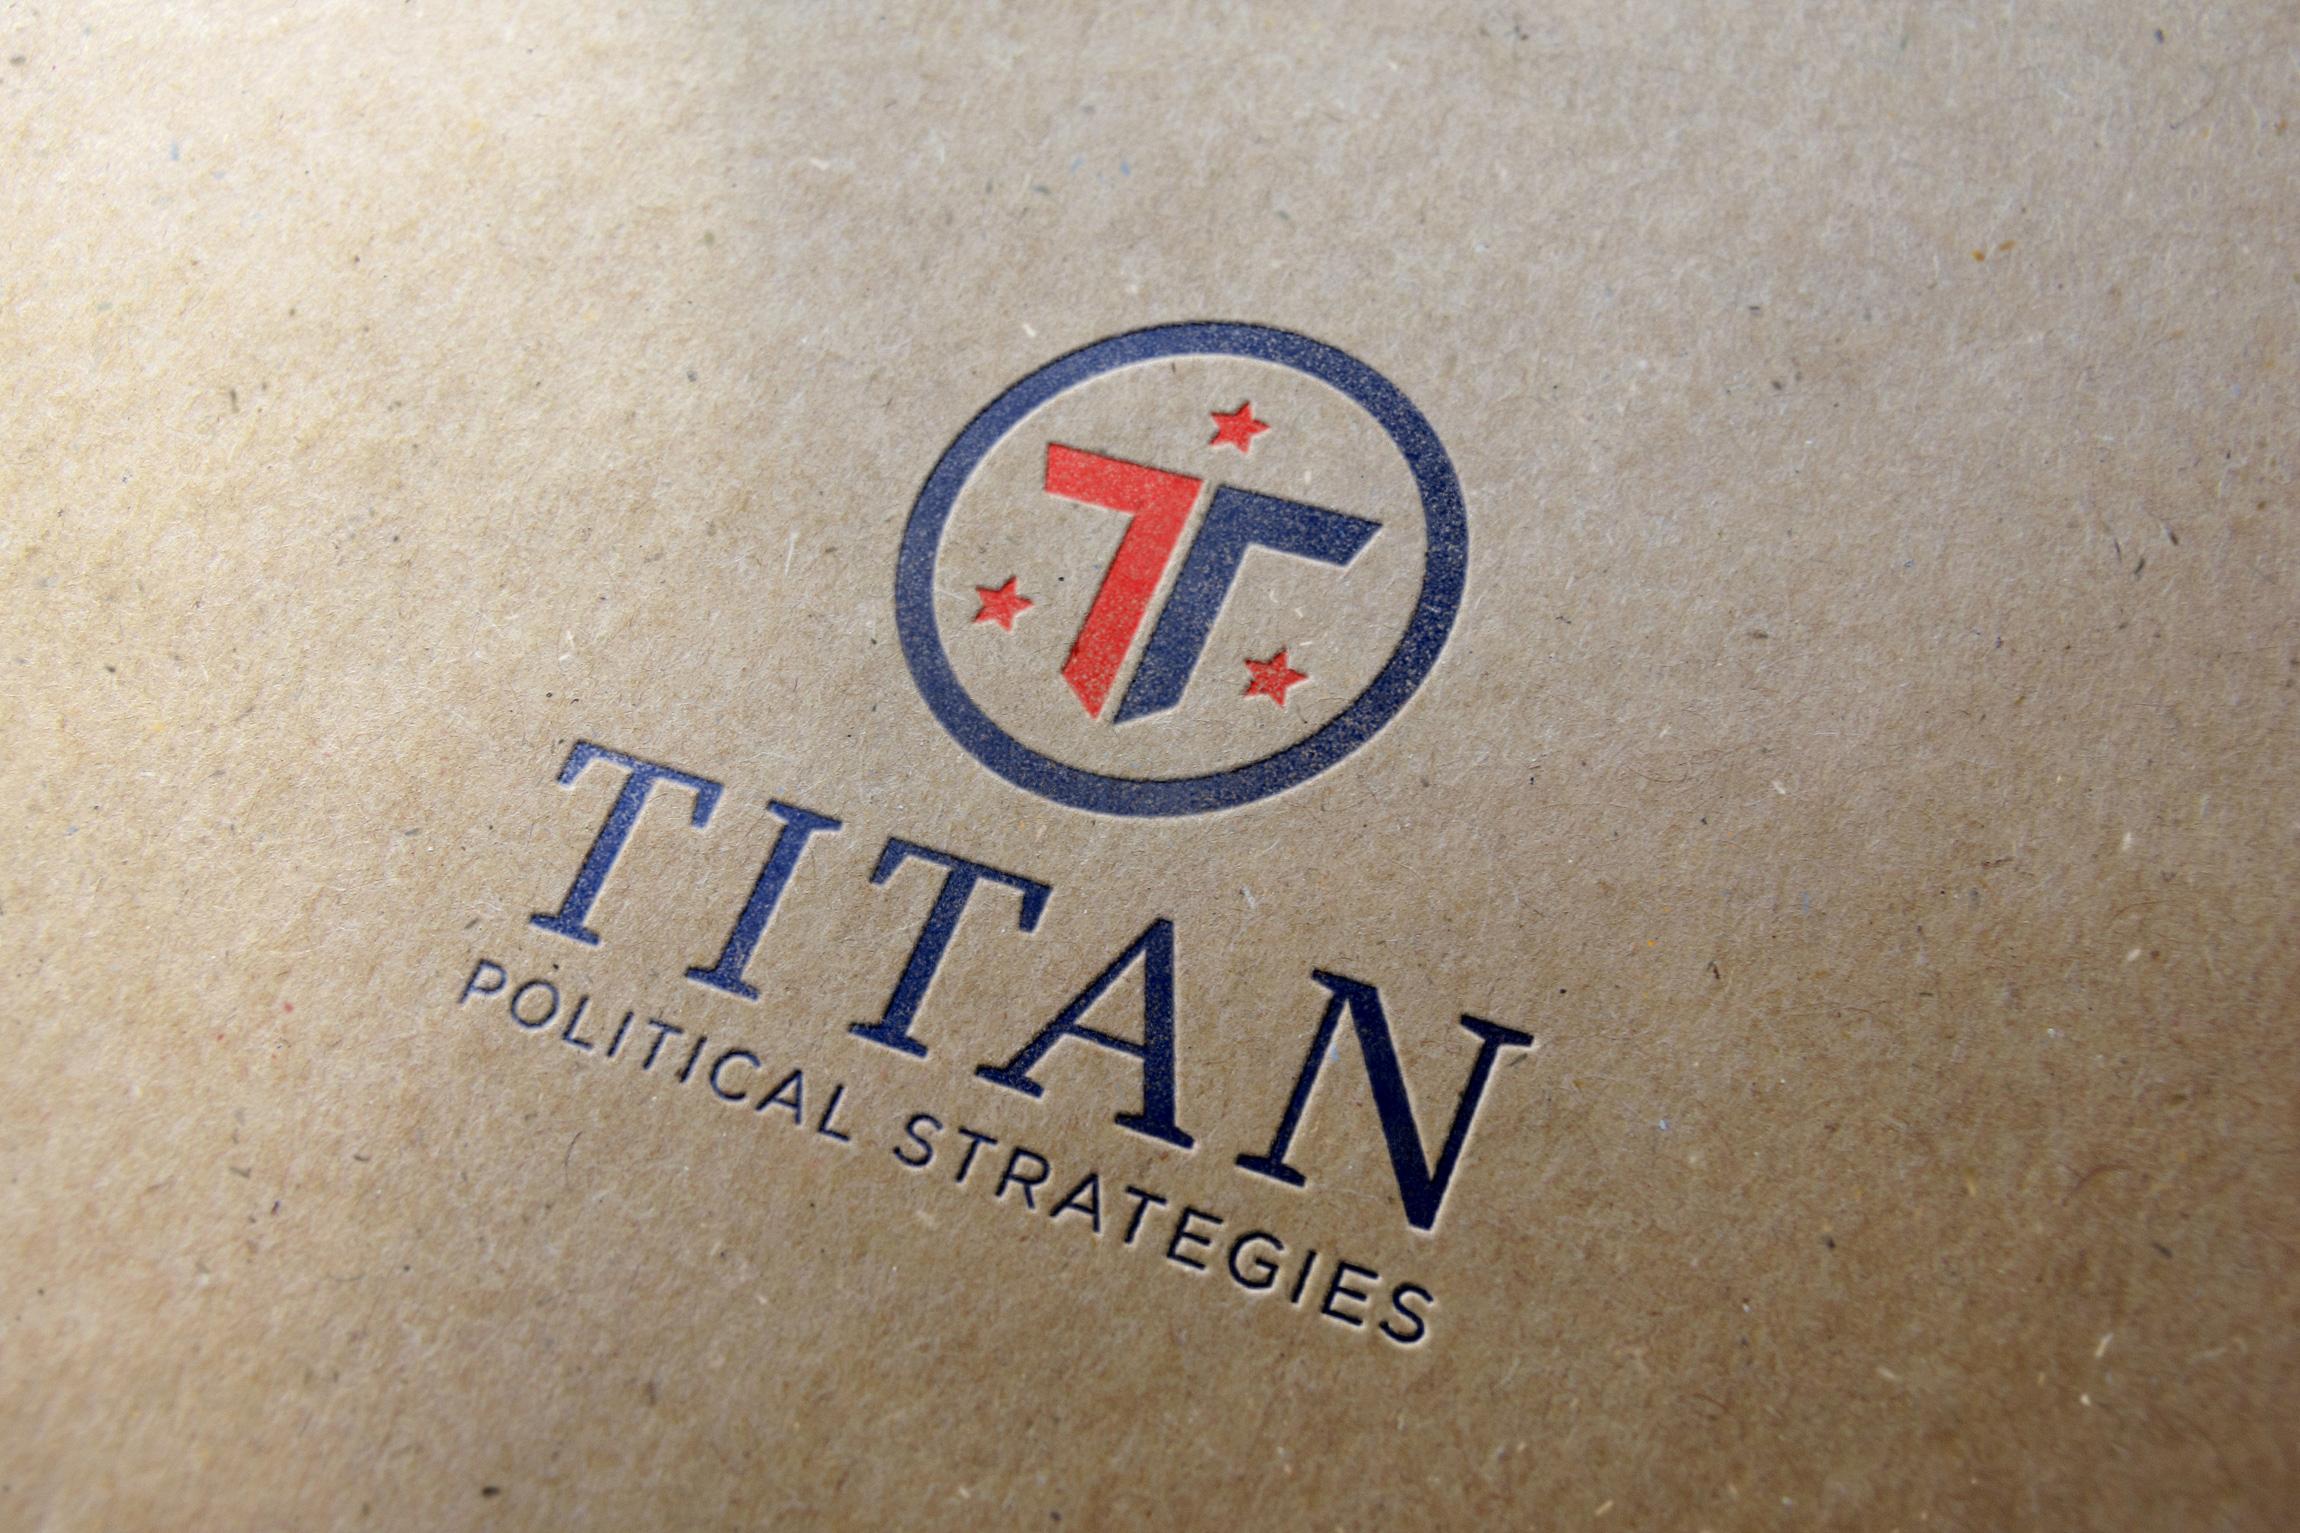 Titan Political Services Brand Identity    Services provided: Logo Design, Corporate Design Guidelines